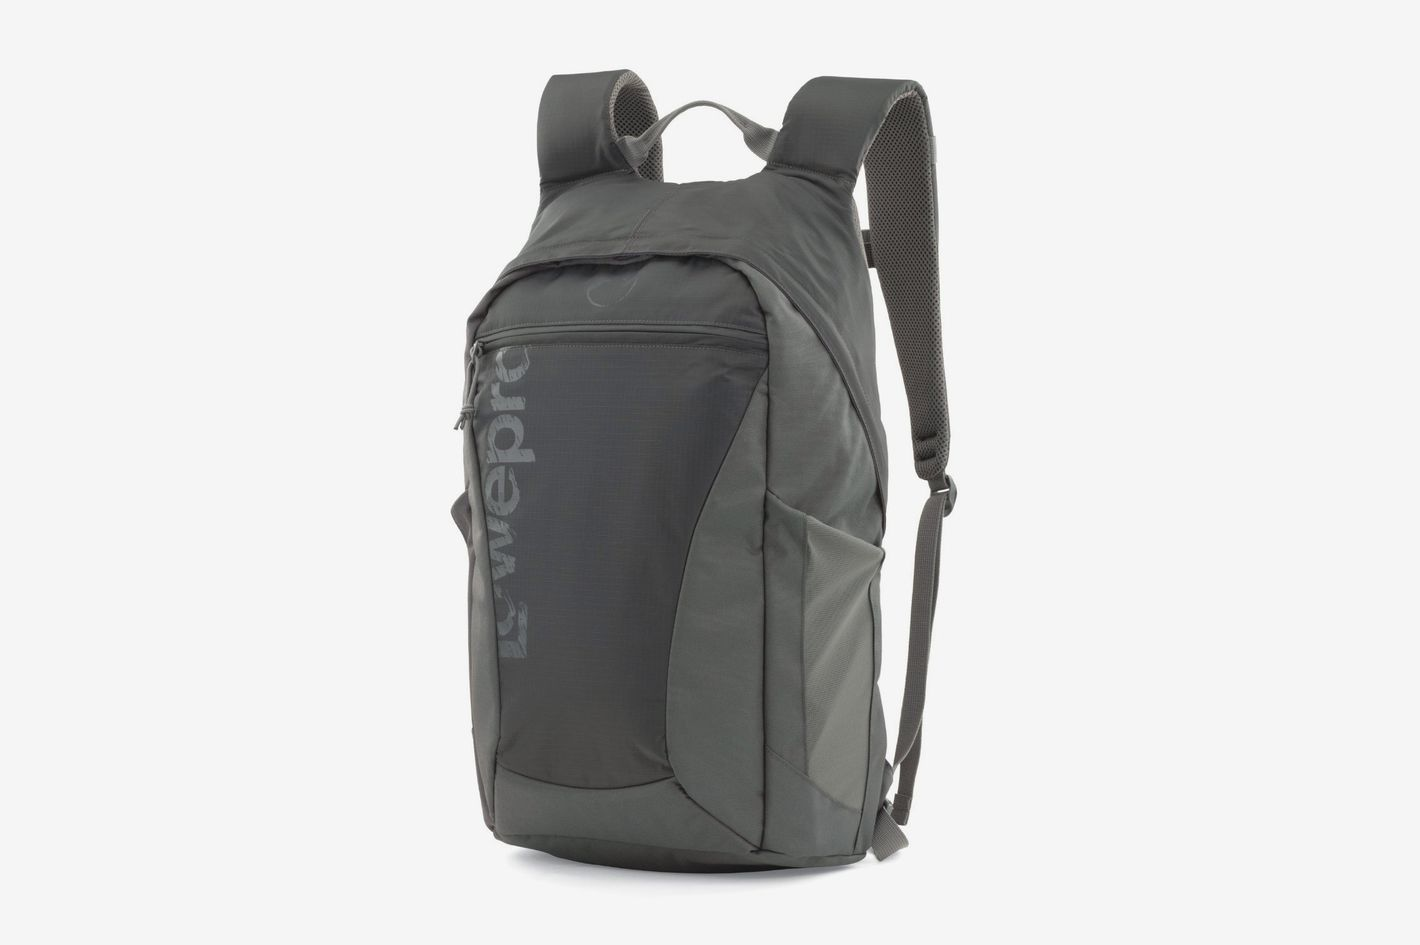 Lowepro Photo Hatchback 16L Camera Backpack